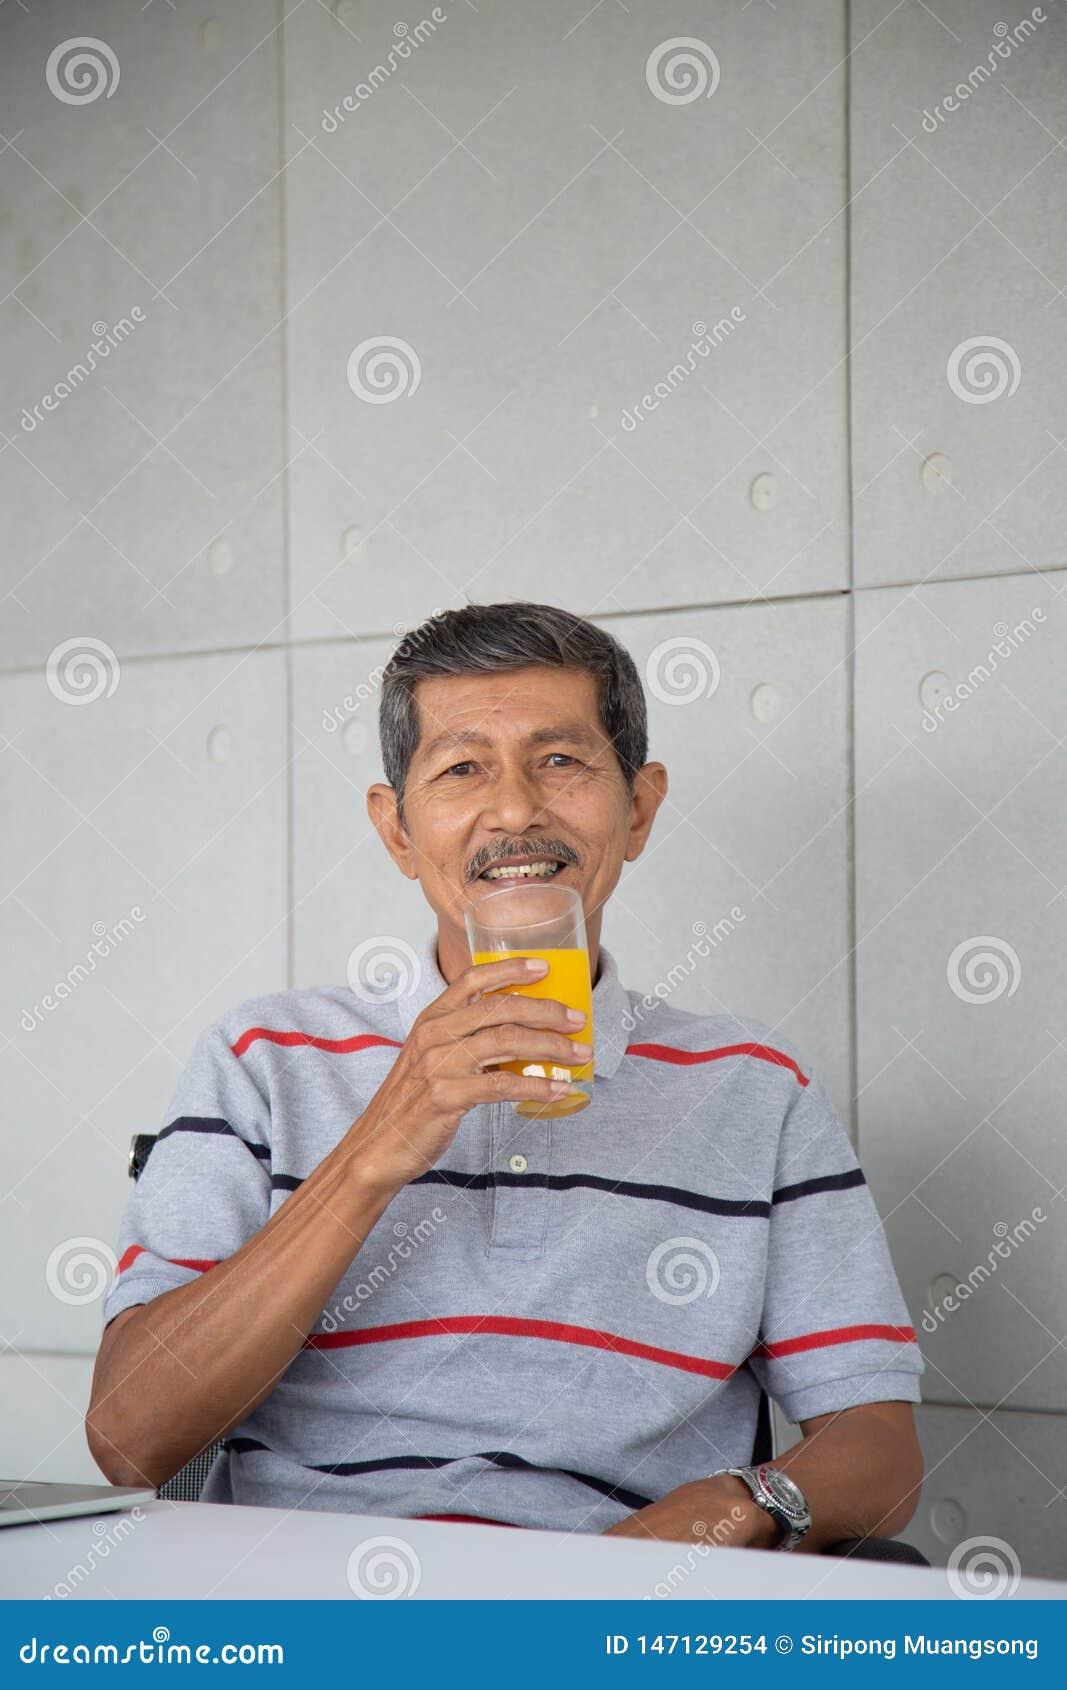 Old man drink orange juice for healthy in his work room